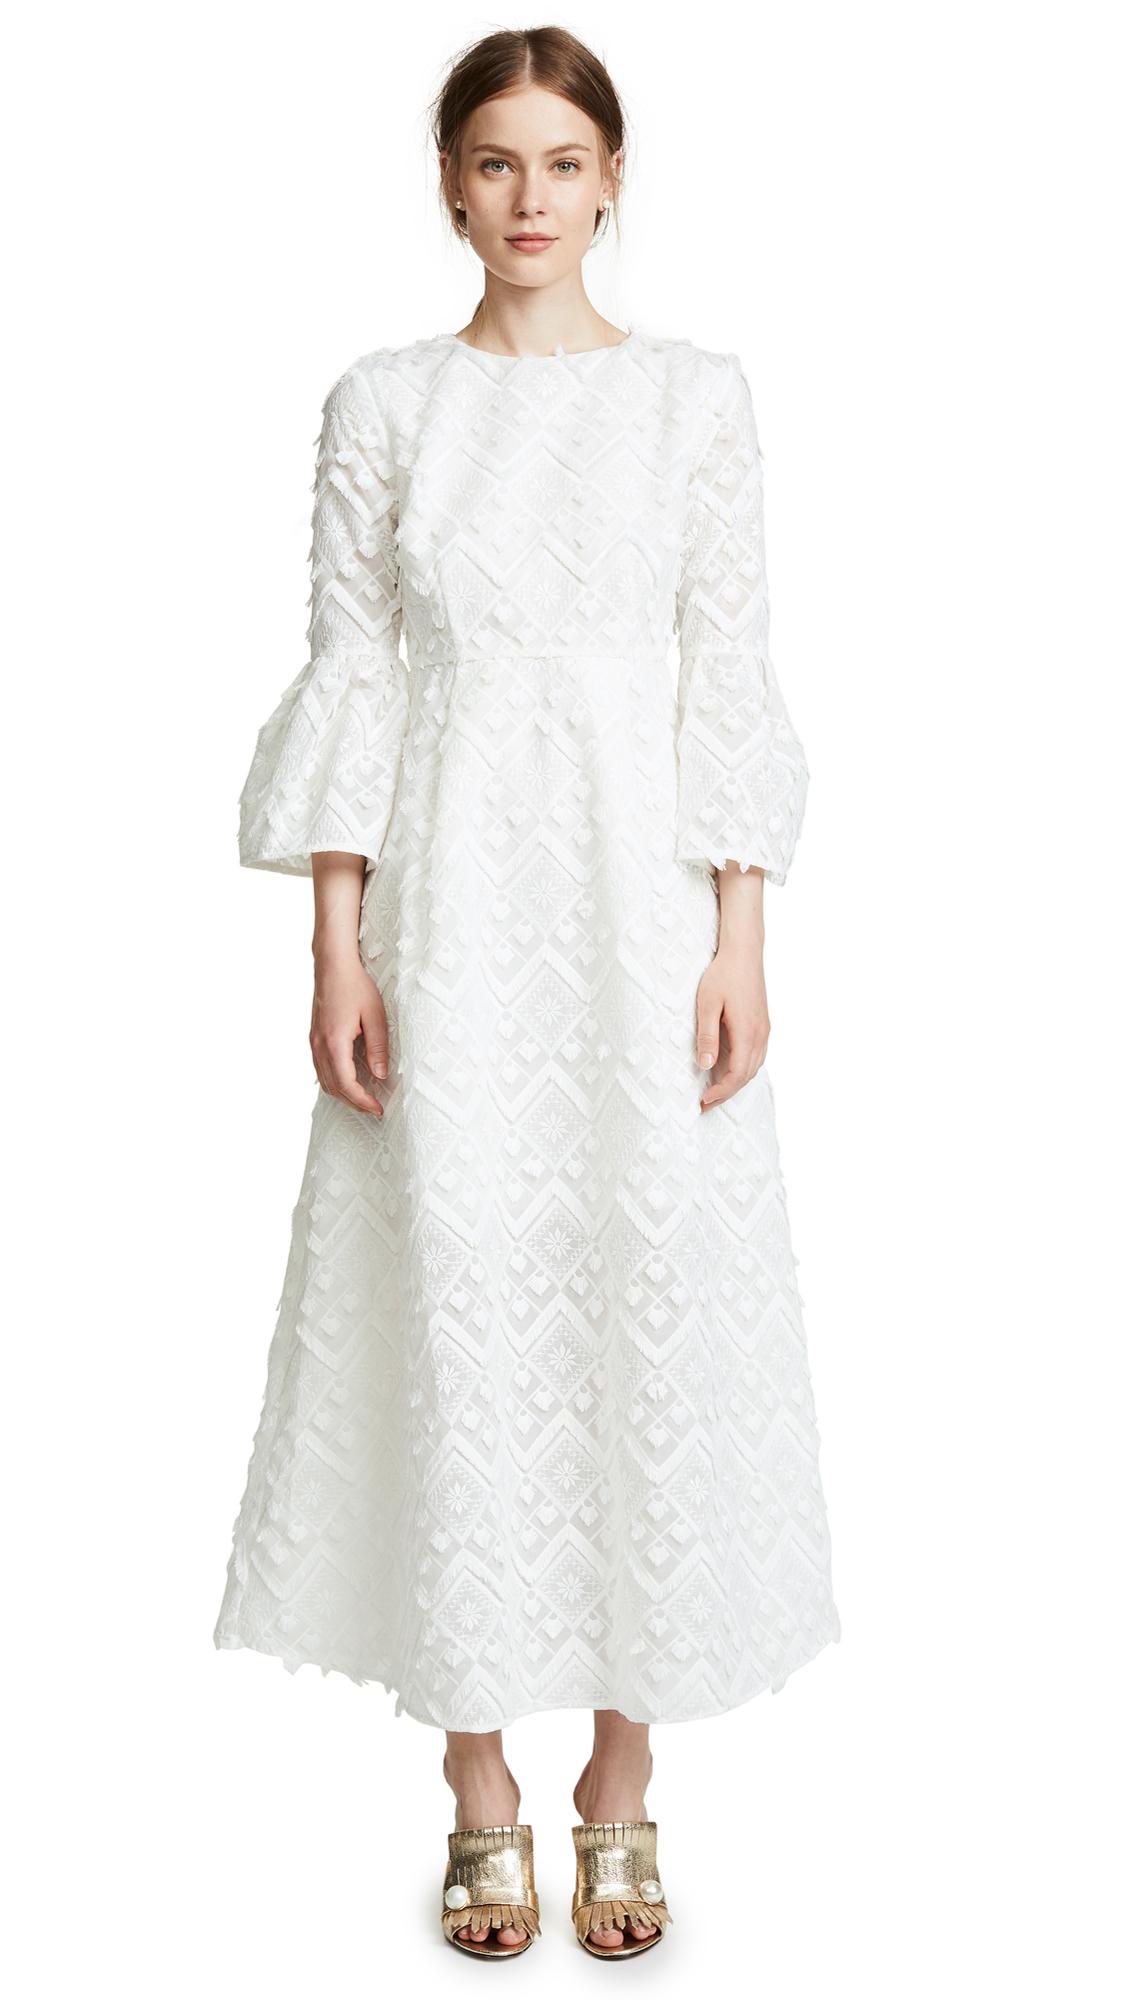 Cynthia Rowley Romy Lace Bell Sleeve Dress